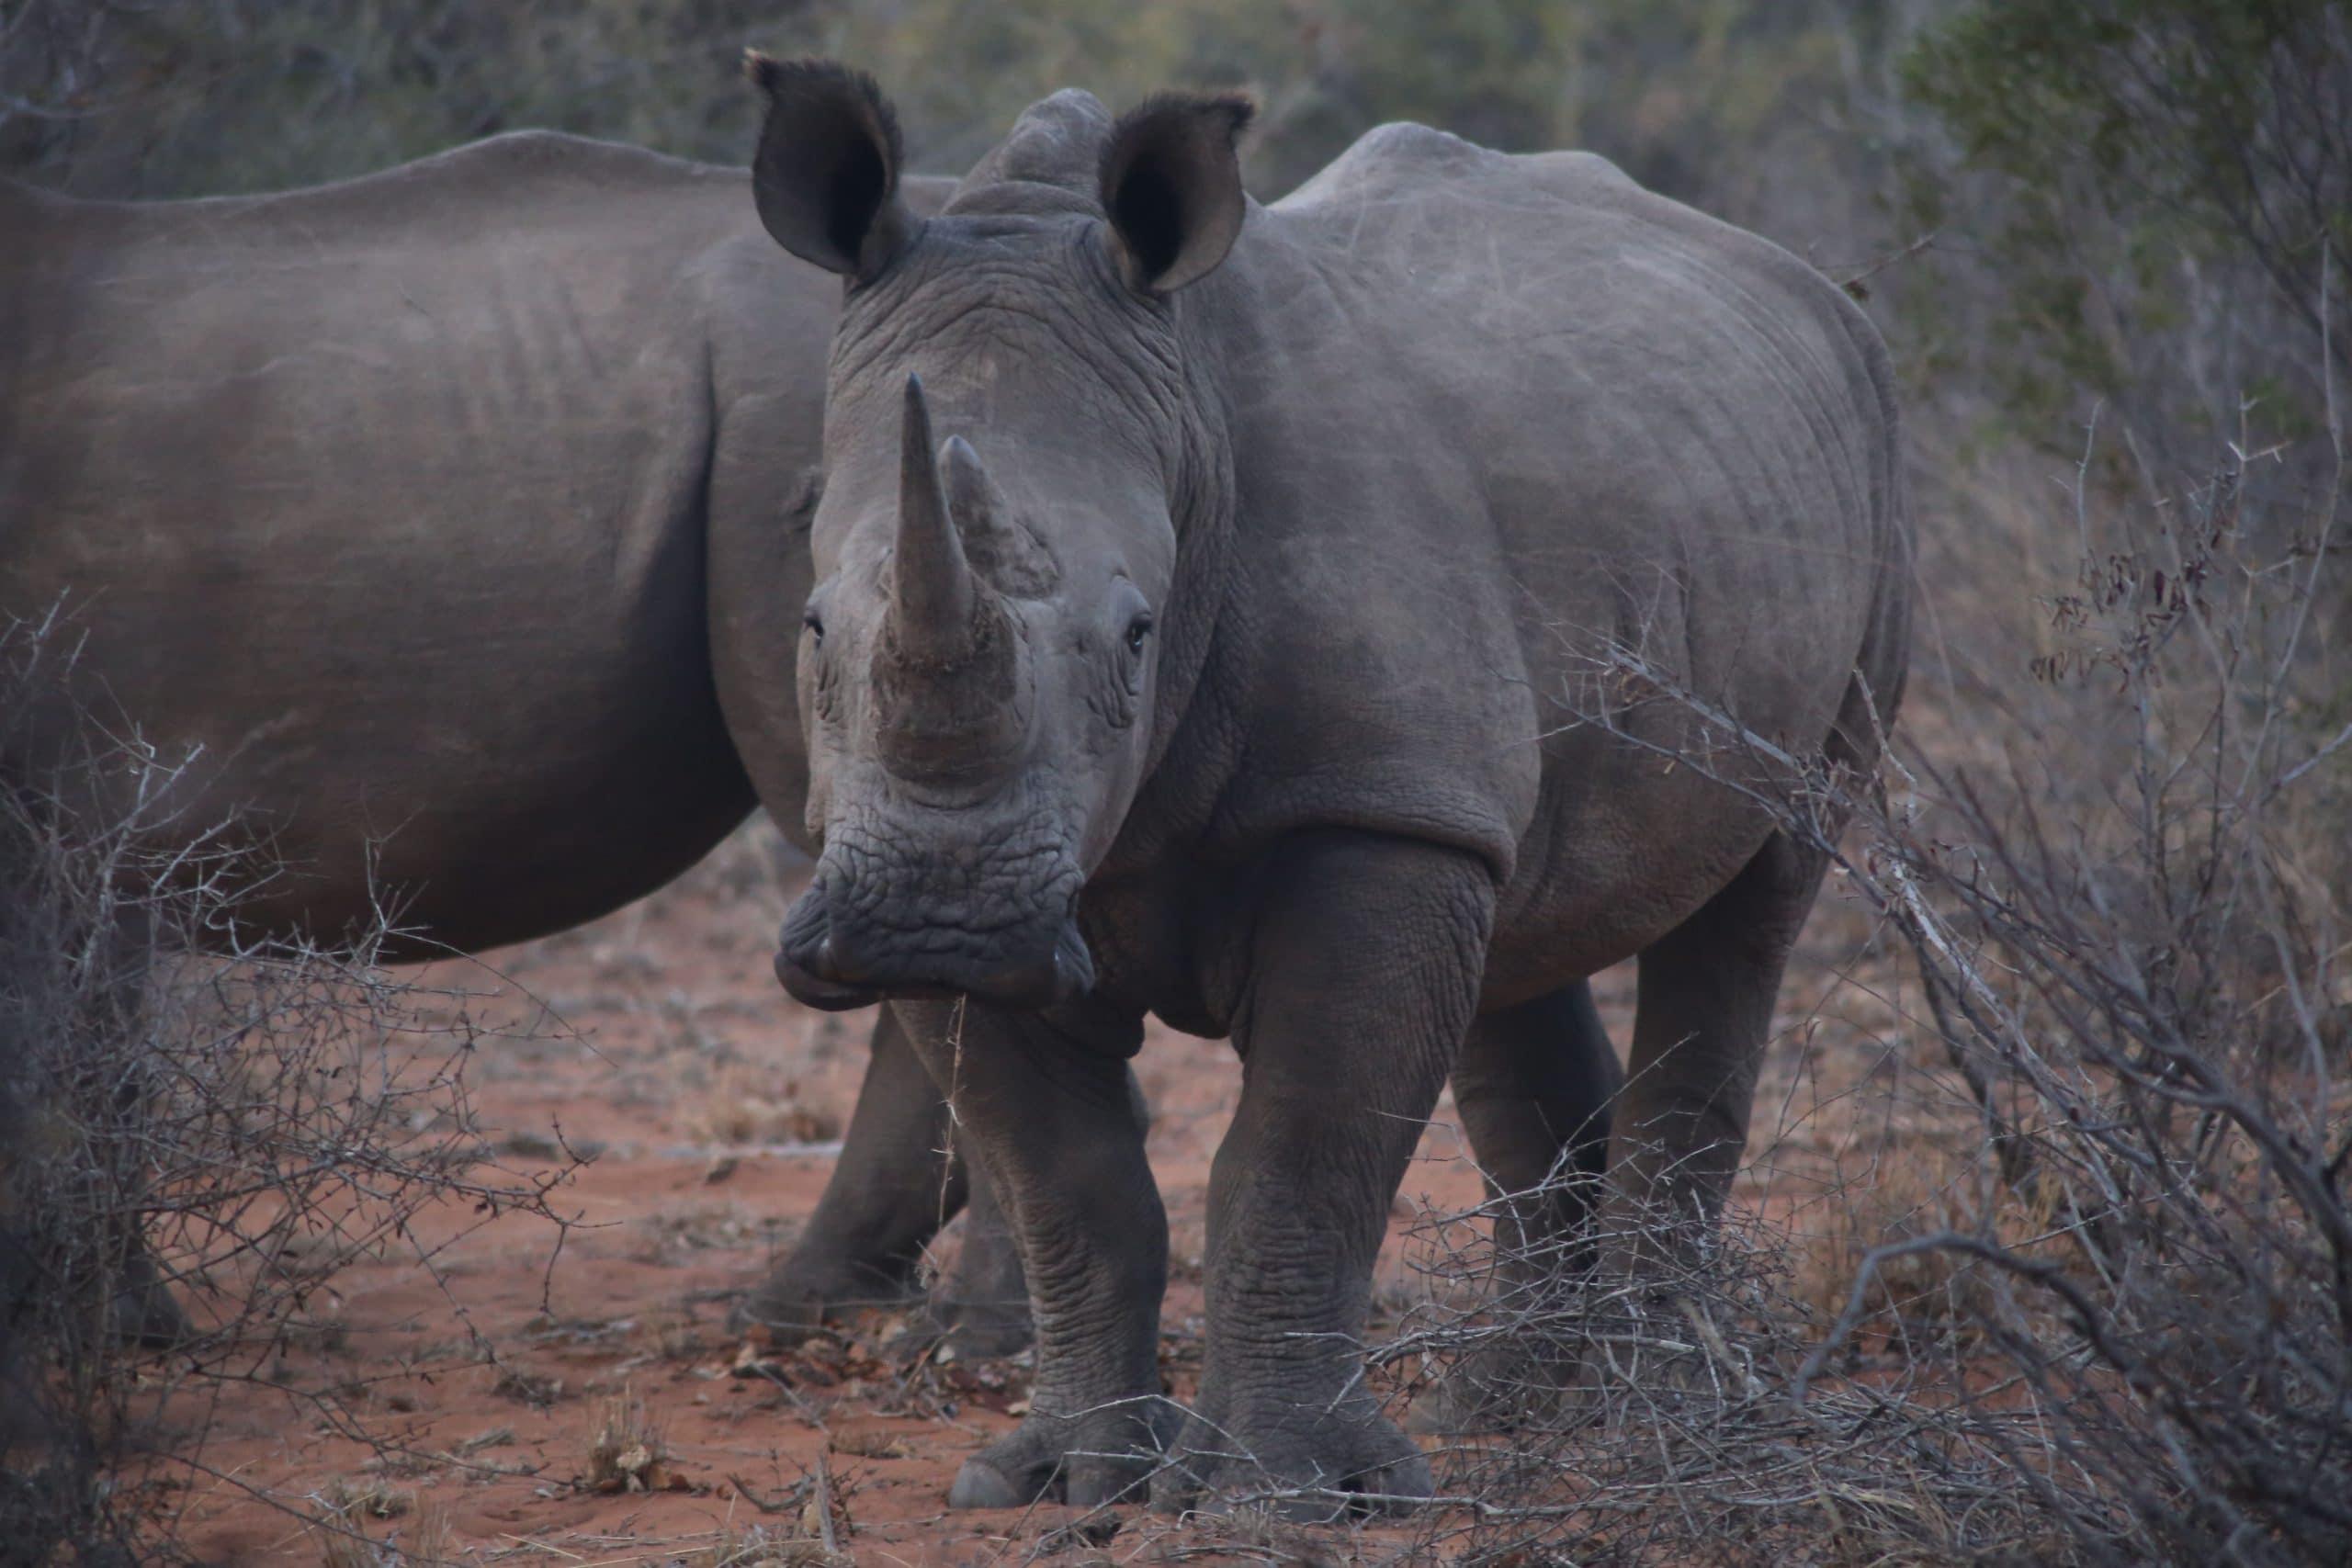 CITES rhinos